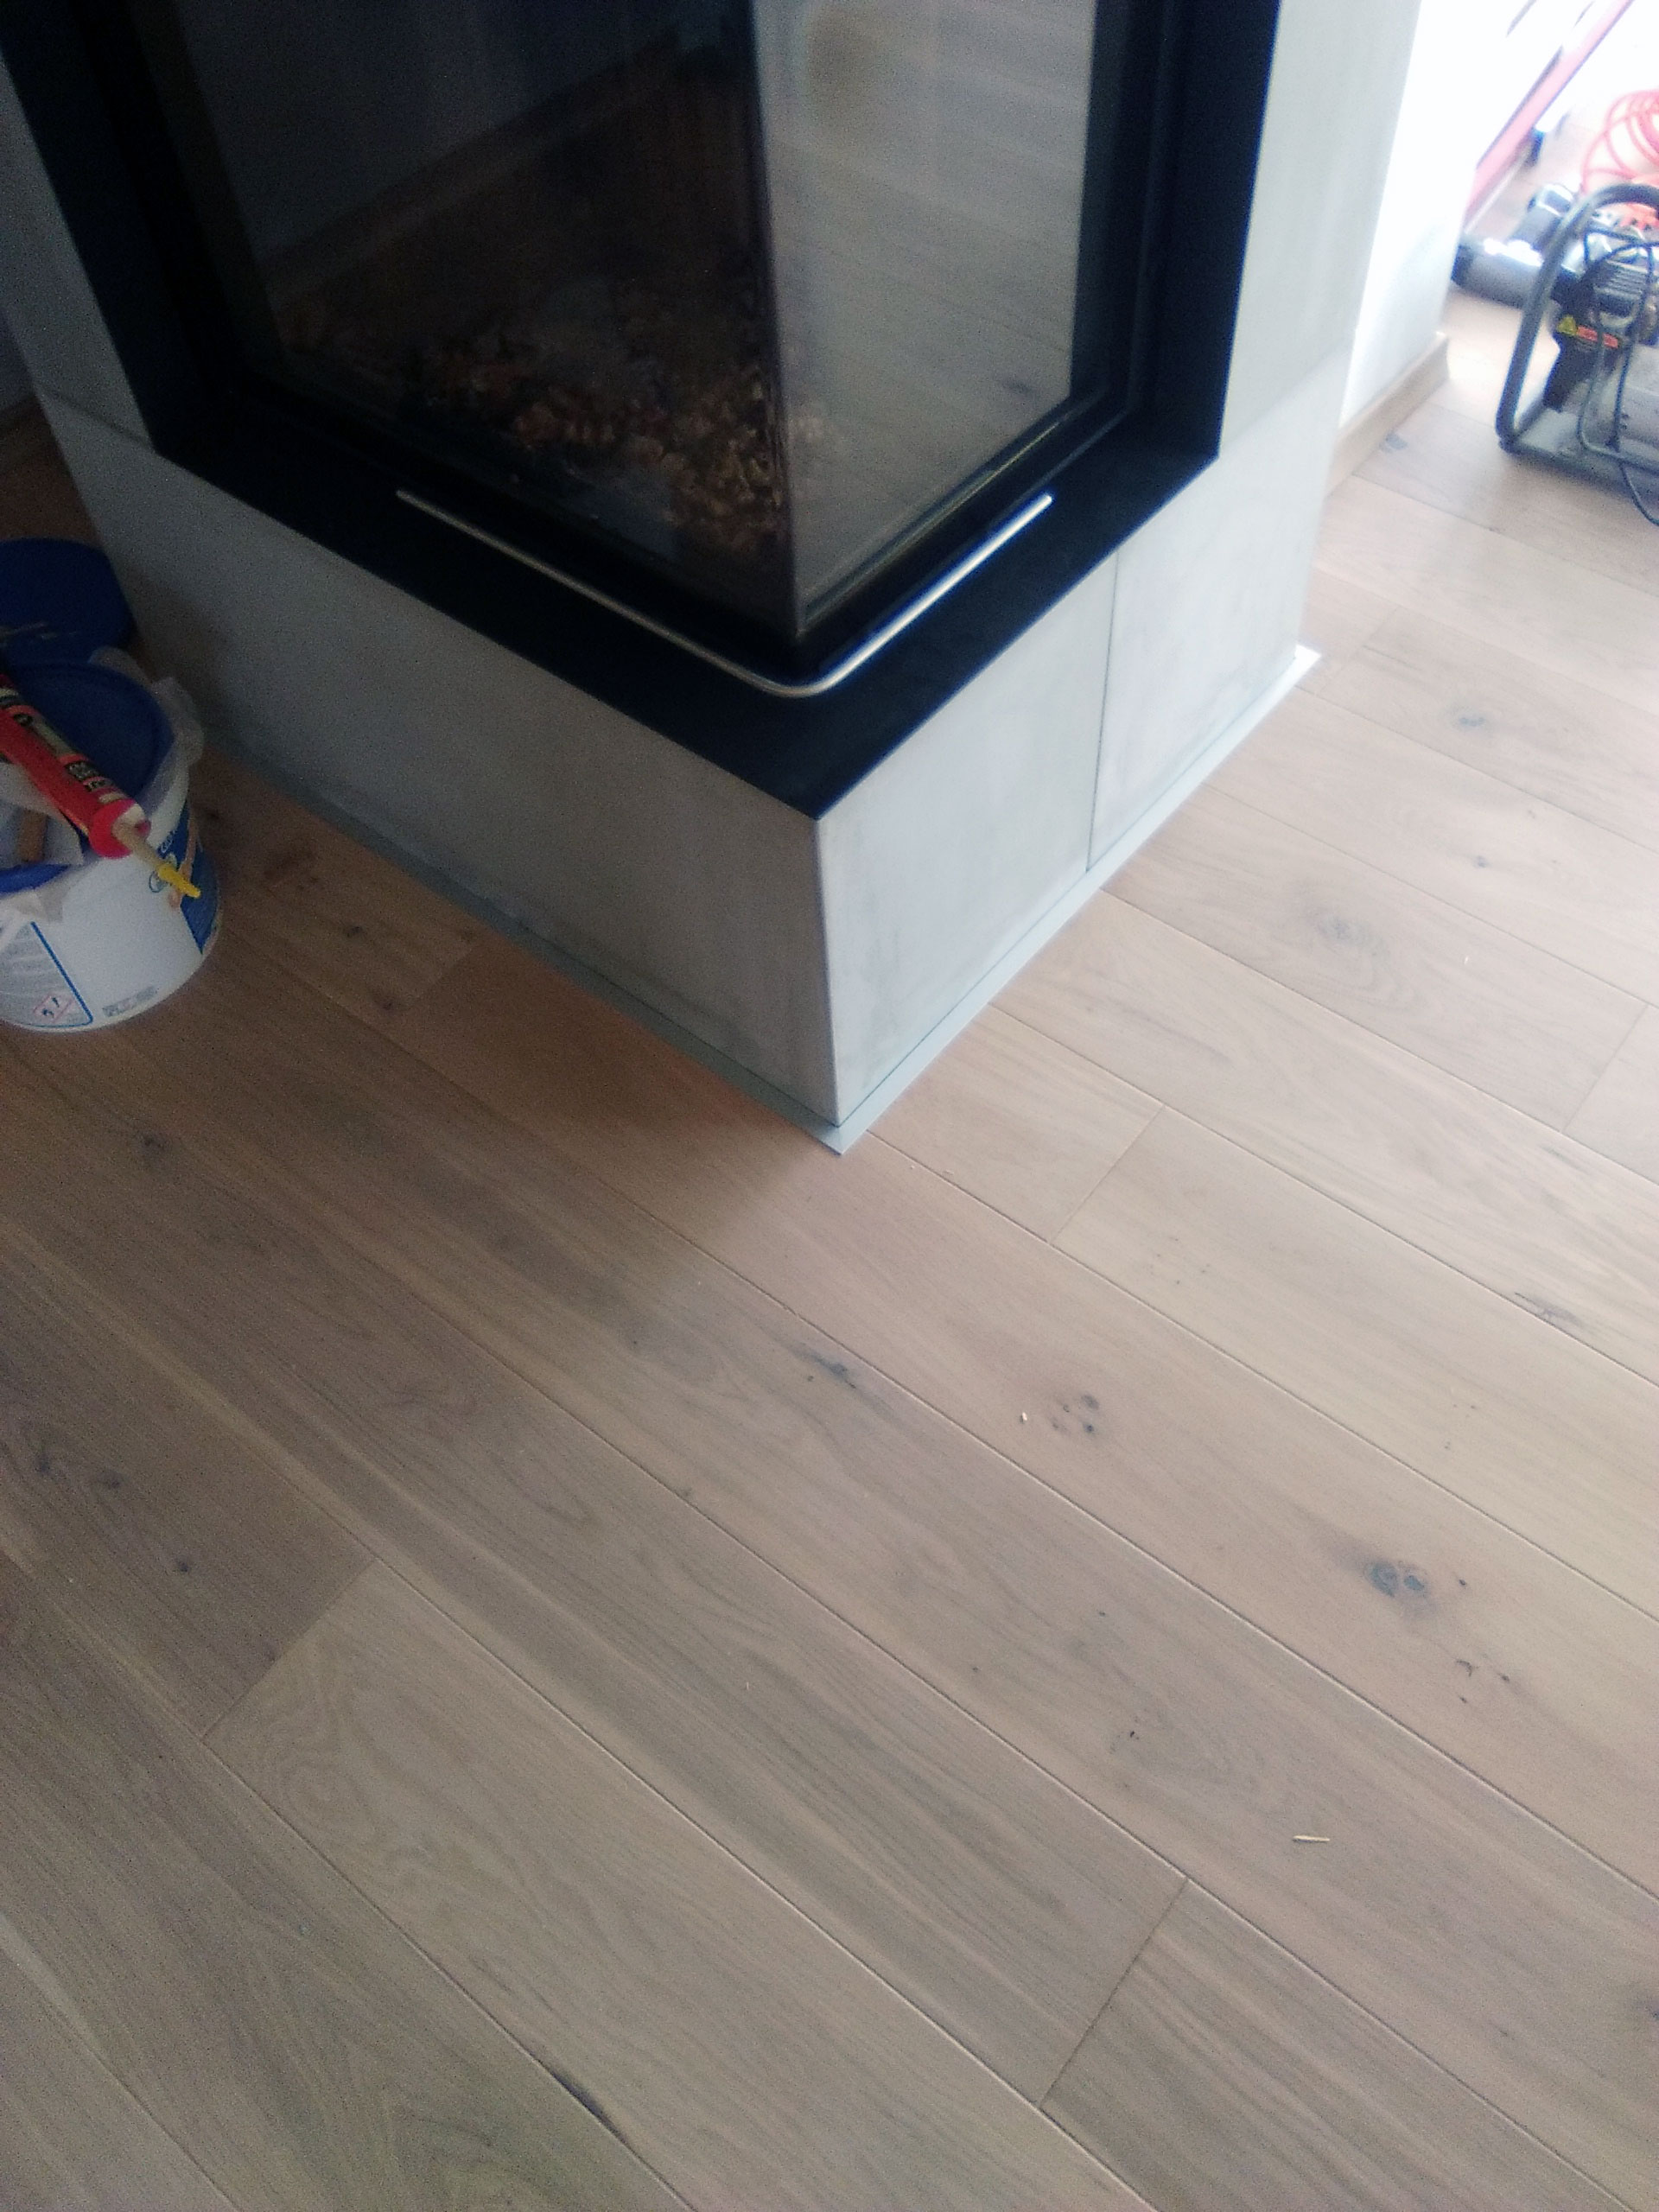 dom jednorodzinny gogolin astpol panele opole pod ogi opole drewniane monta drzwi. Black Bedroom Furniture Sets. Home Design Ideas